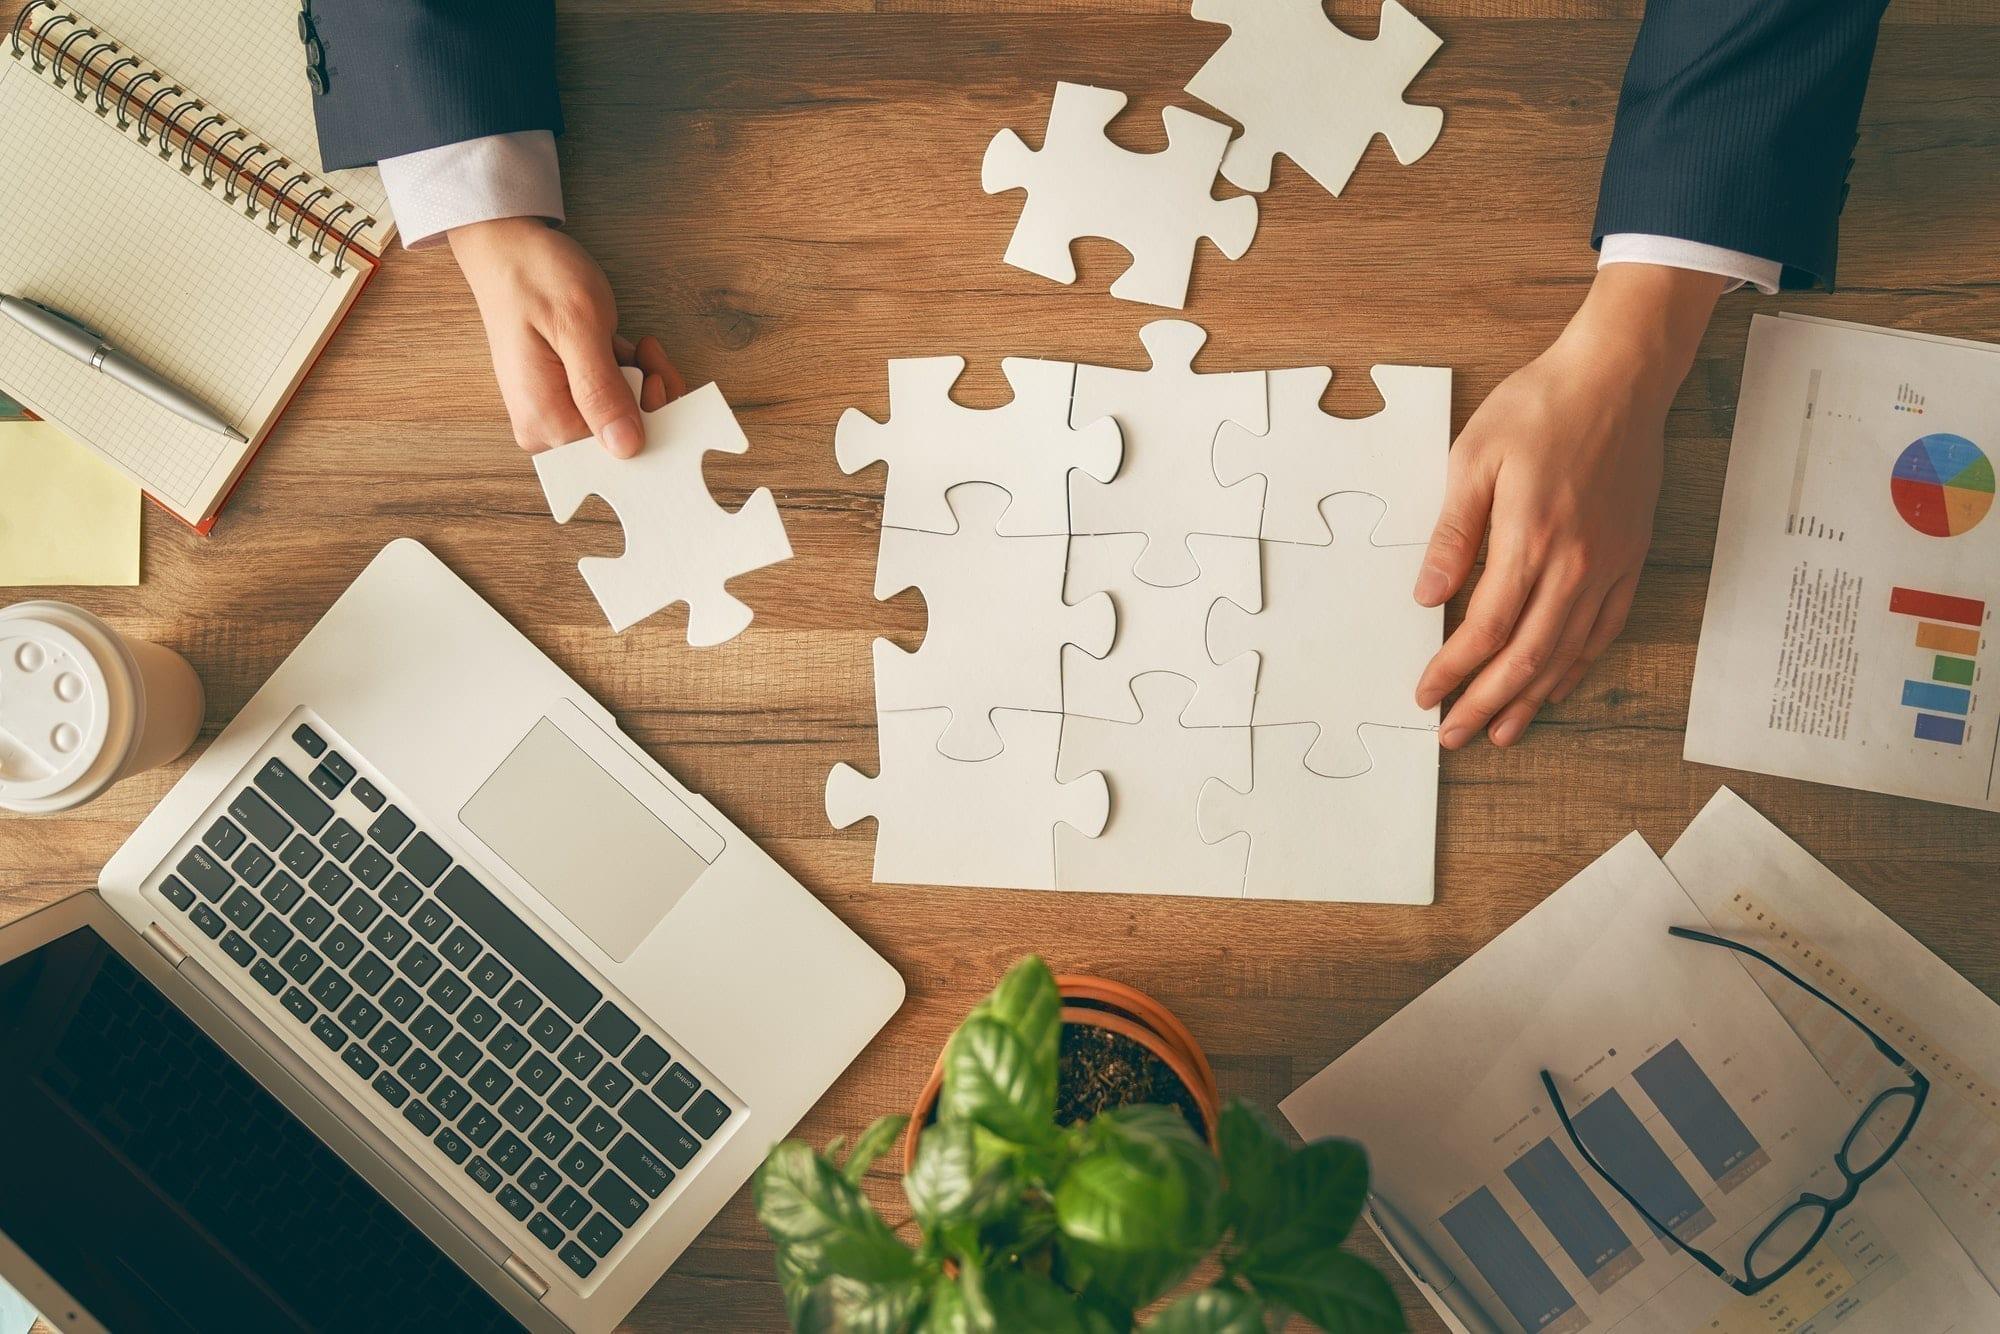 Concept of business strategy, formulate a plan, team spirit